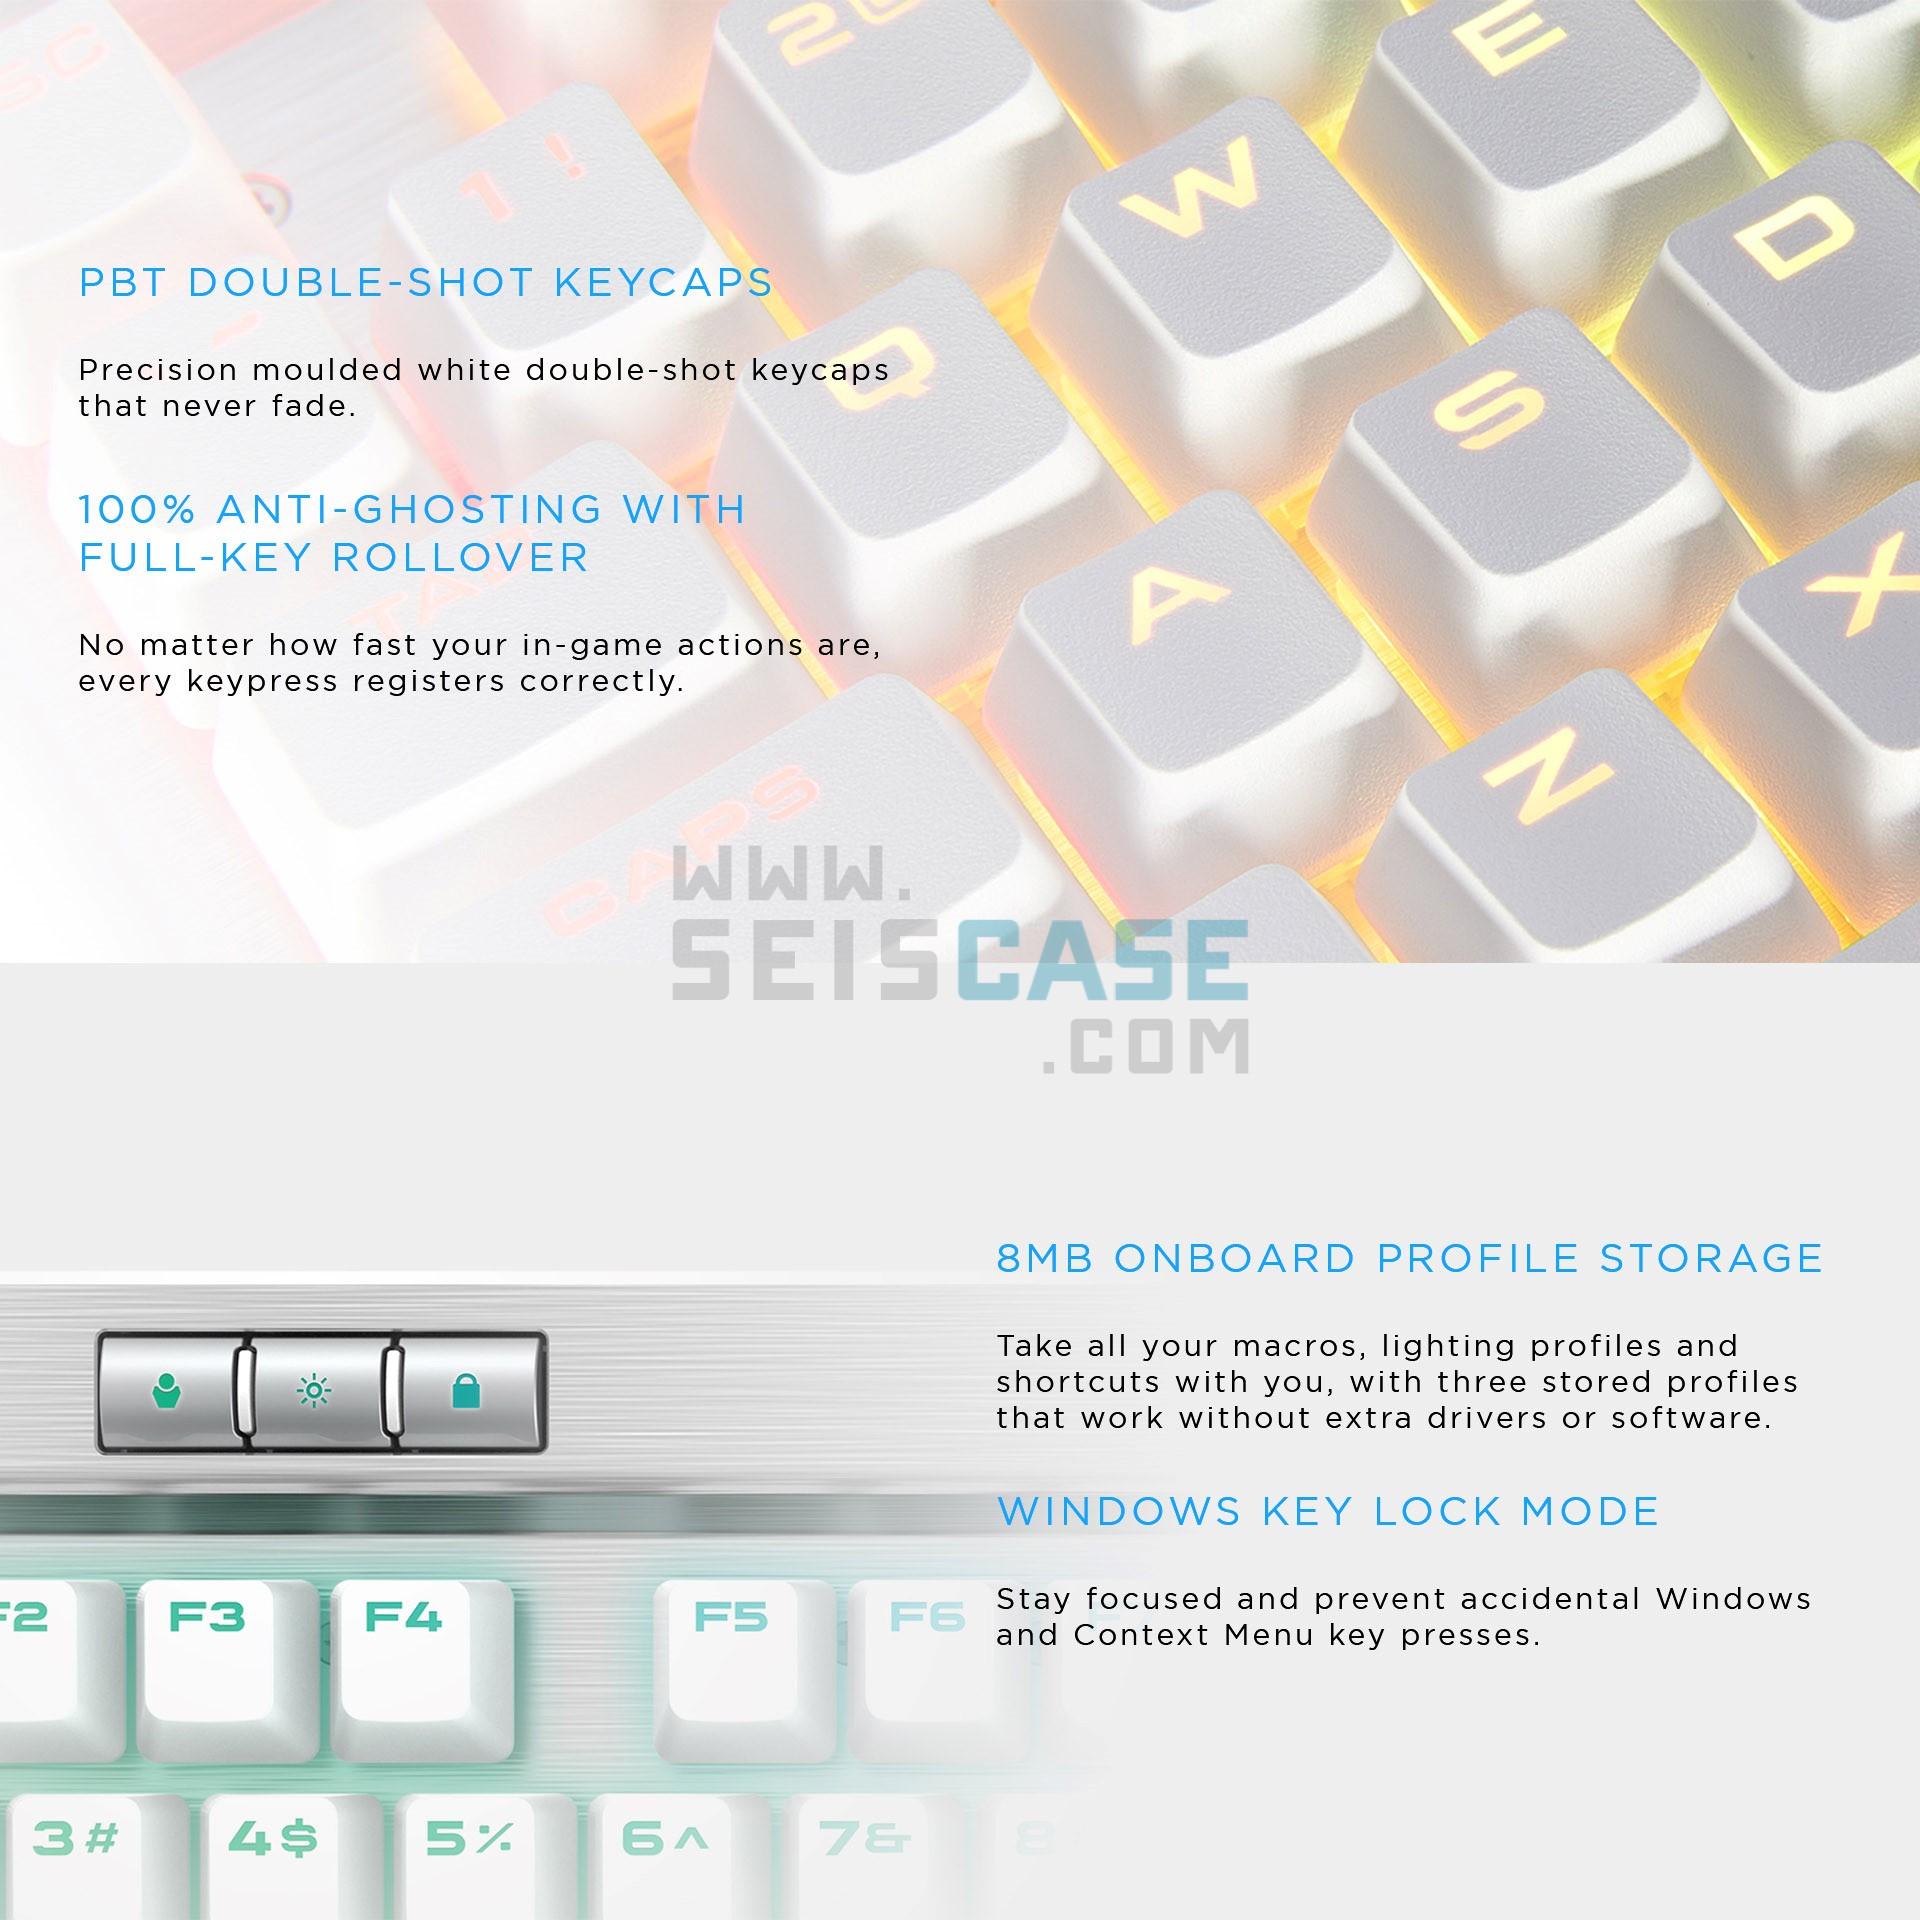 CORSAIR K70 RGB MK 2 SE Mechanical Gaming Keyboard Cherry MX Speed